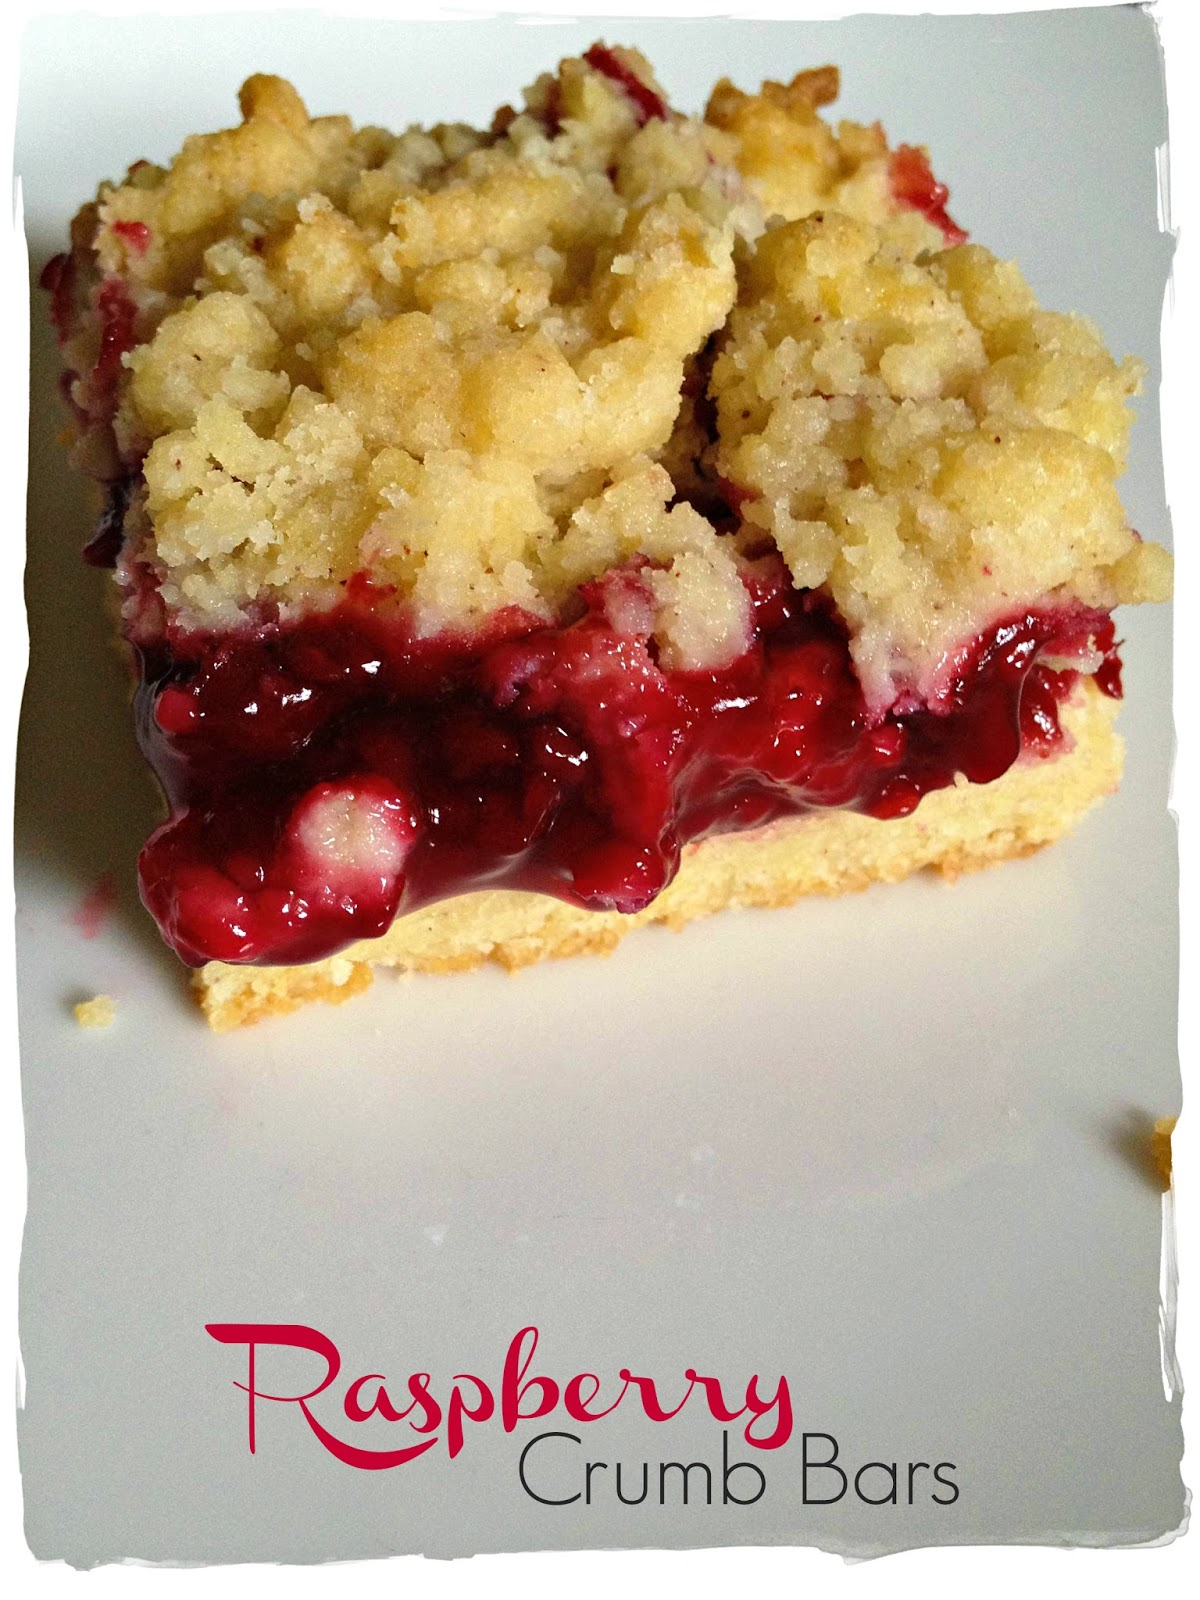 Life's Simple Measures: Secret Recipe Club: Raspberry Crumb Bars